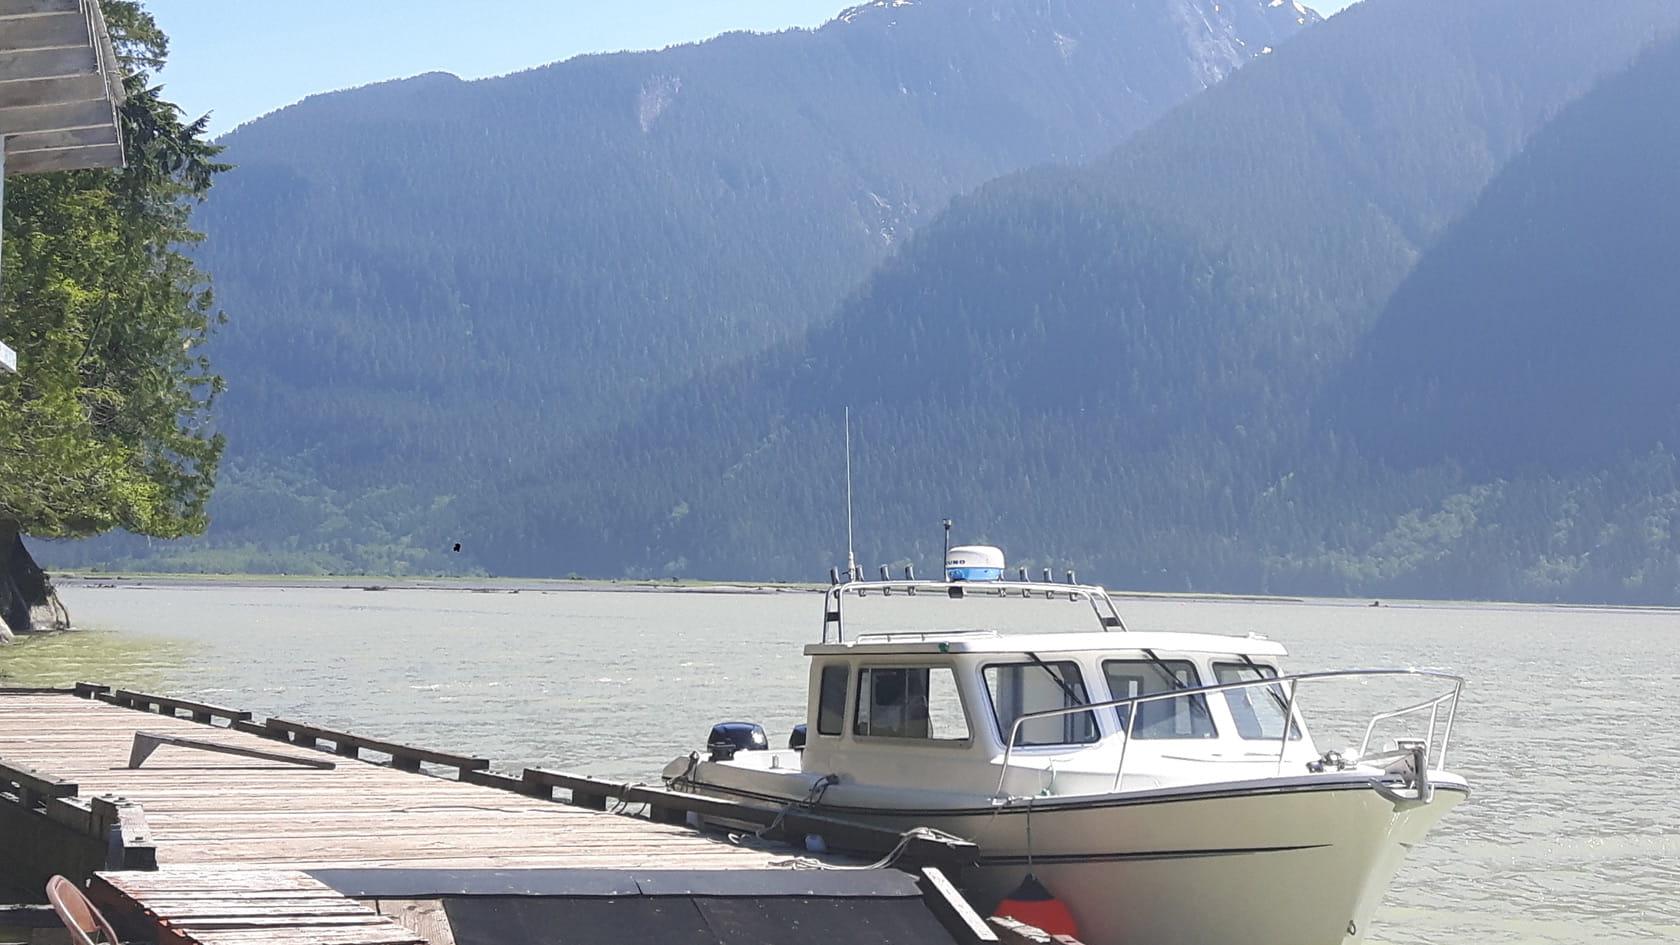 24-foot Sea West boat